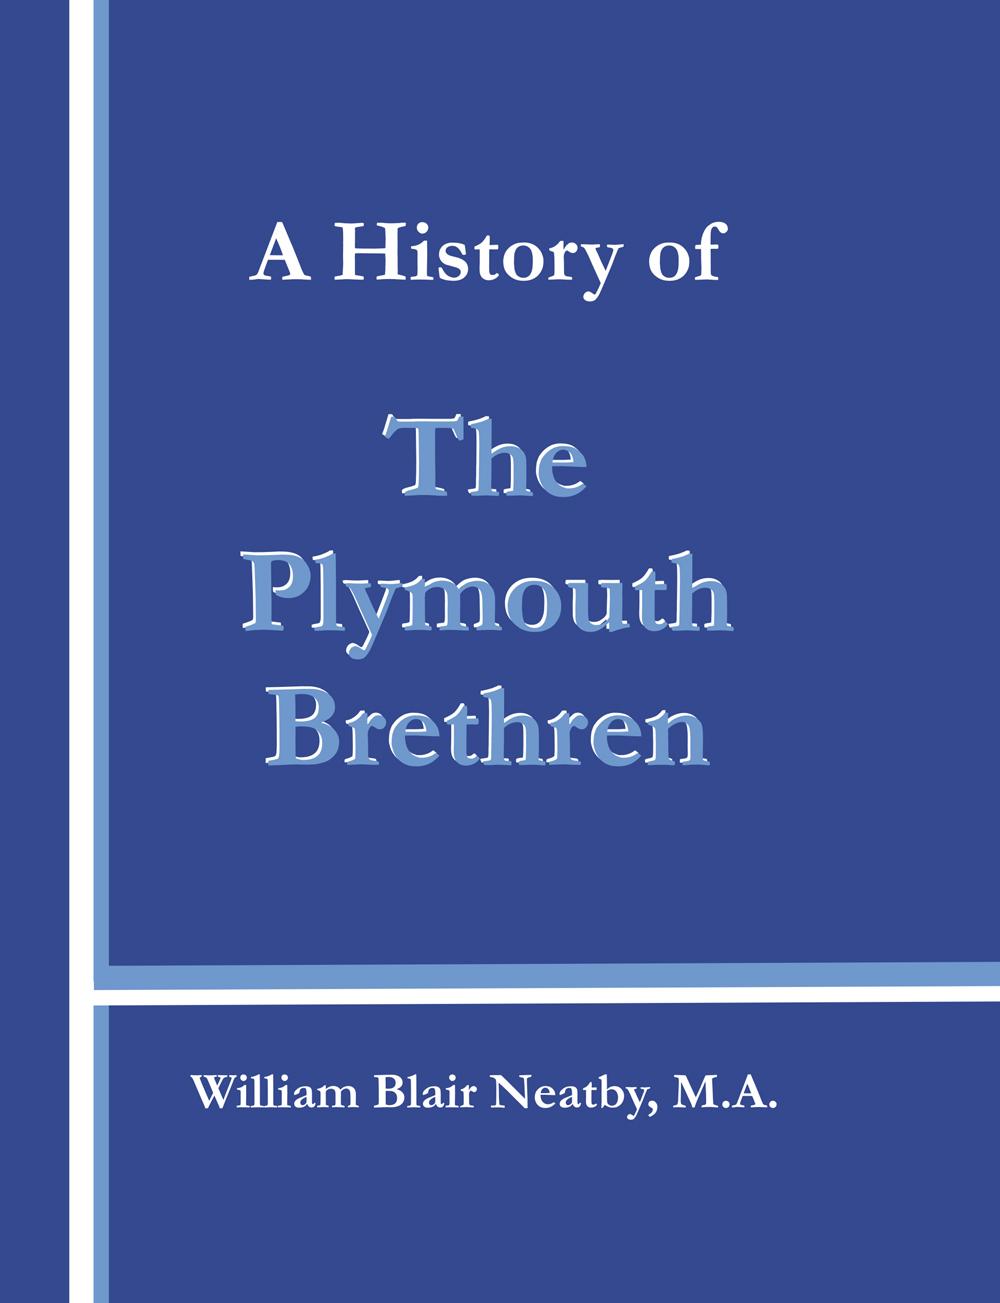 History of the Plymouth Brethren